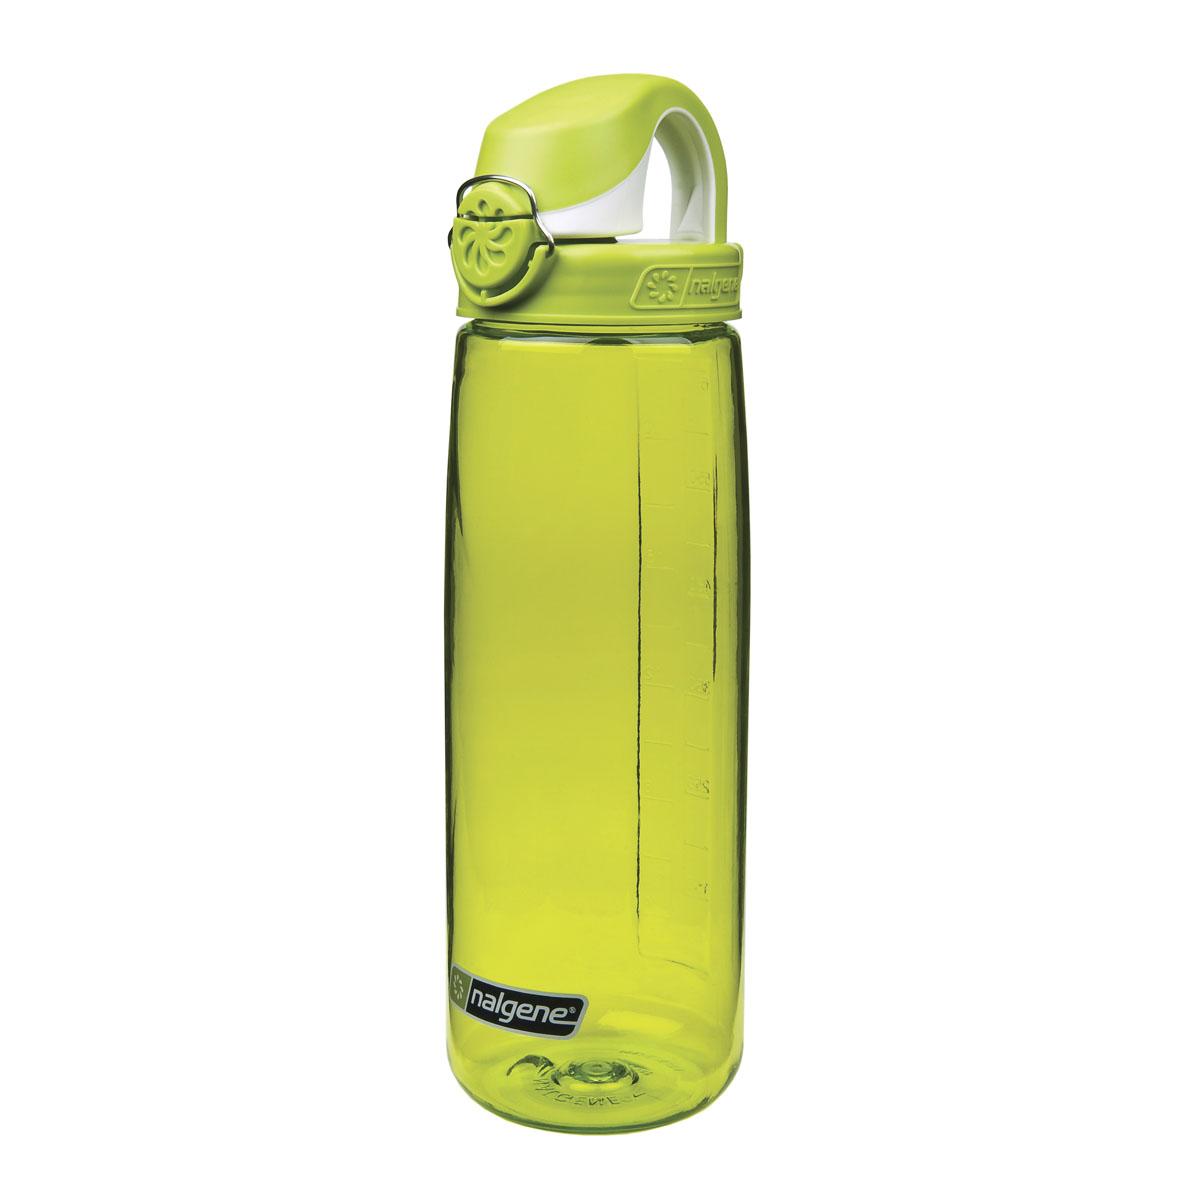 Nalgene Trinkflasche Everyday 1 L slate blau